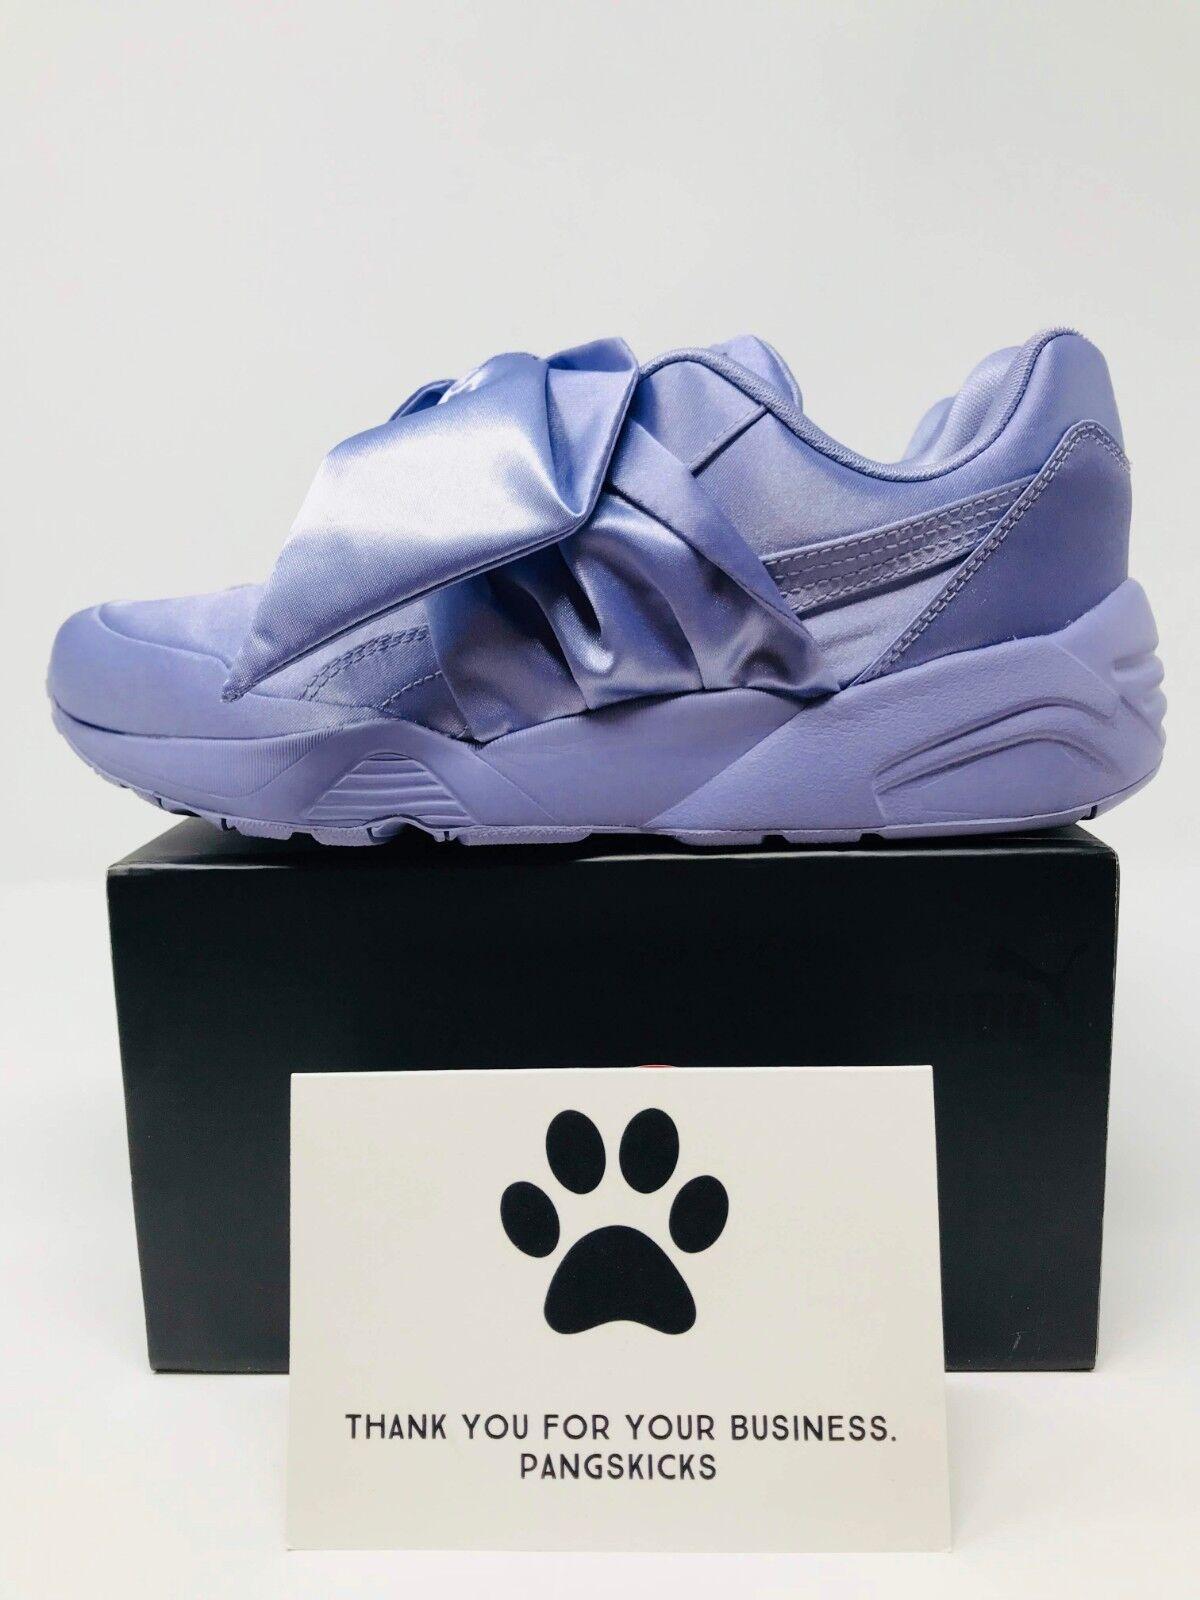 Puma Fenty by Rihanna Rihanna Rihanna Bow Sneaker 'Sweet Lavender' 365054-03 Women's Size 7.5-9 cbc185